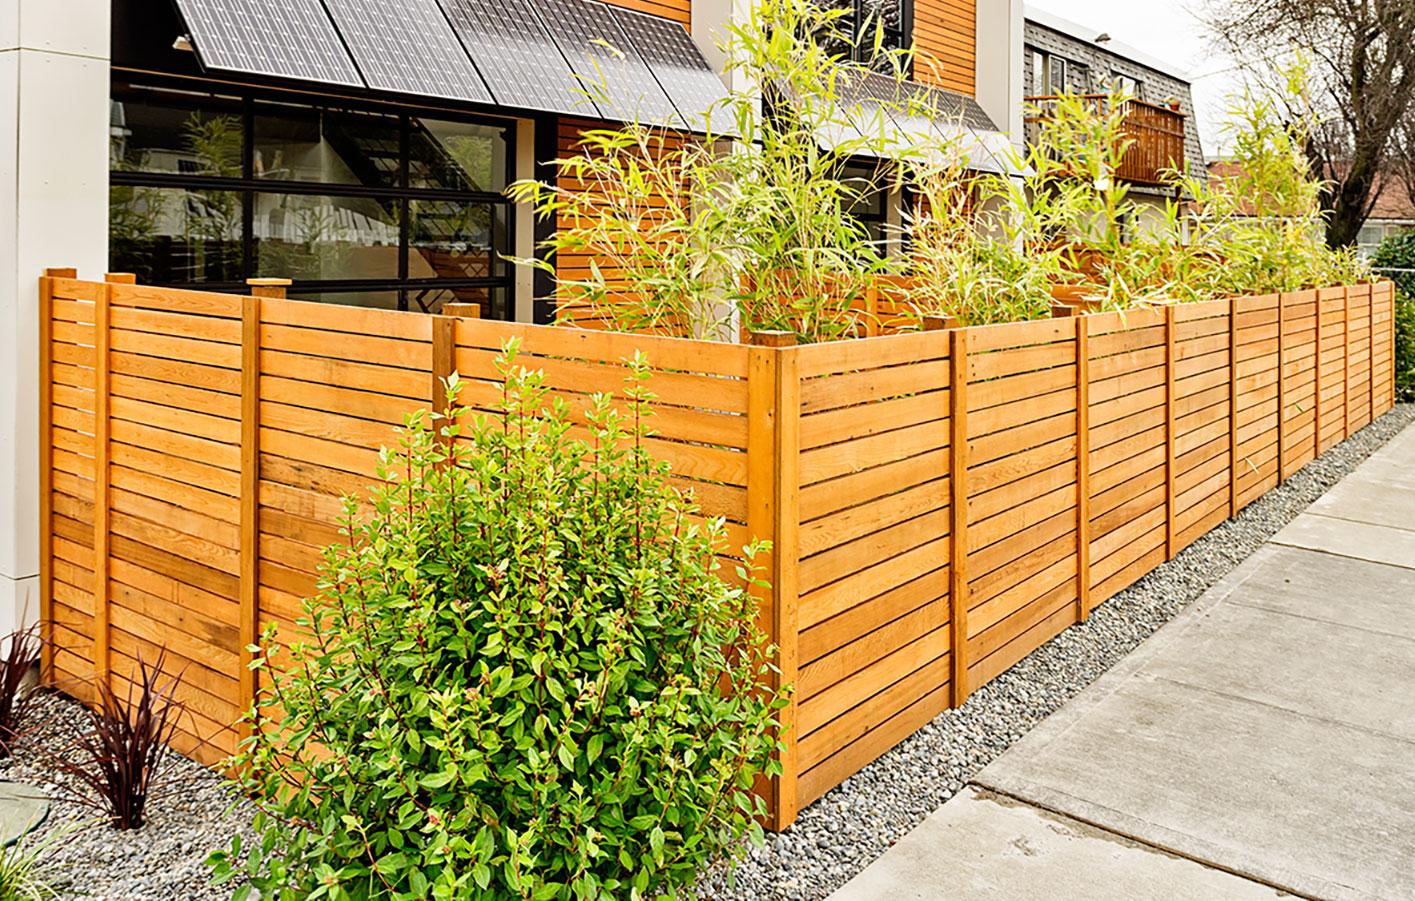 Zaune Sichtschutz Gartenzaun Holzzaun Mainz Wiesbaden Alzey Bingen